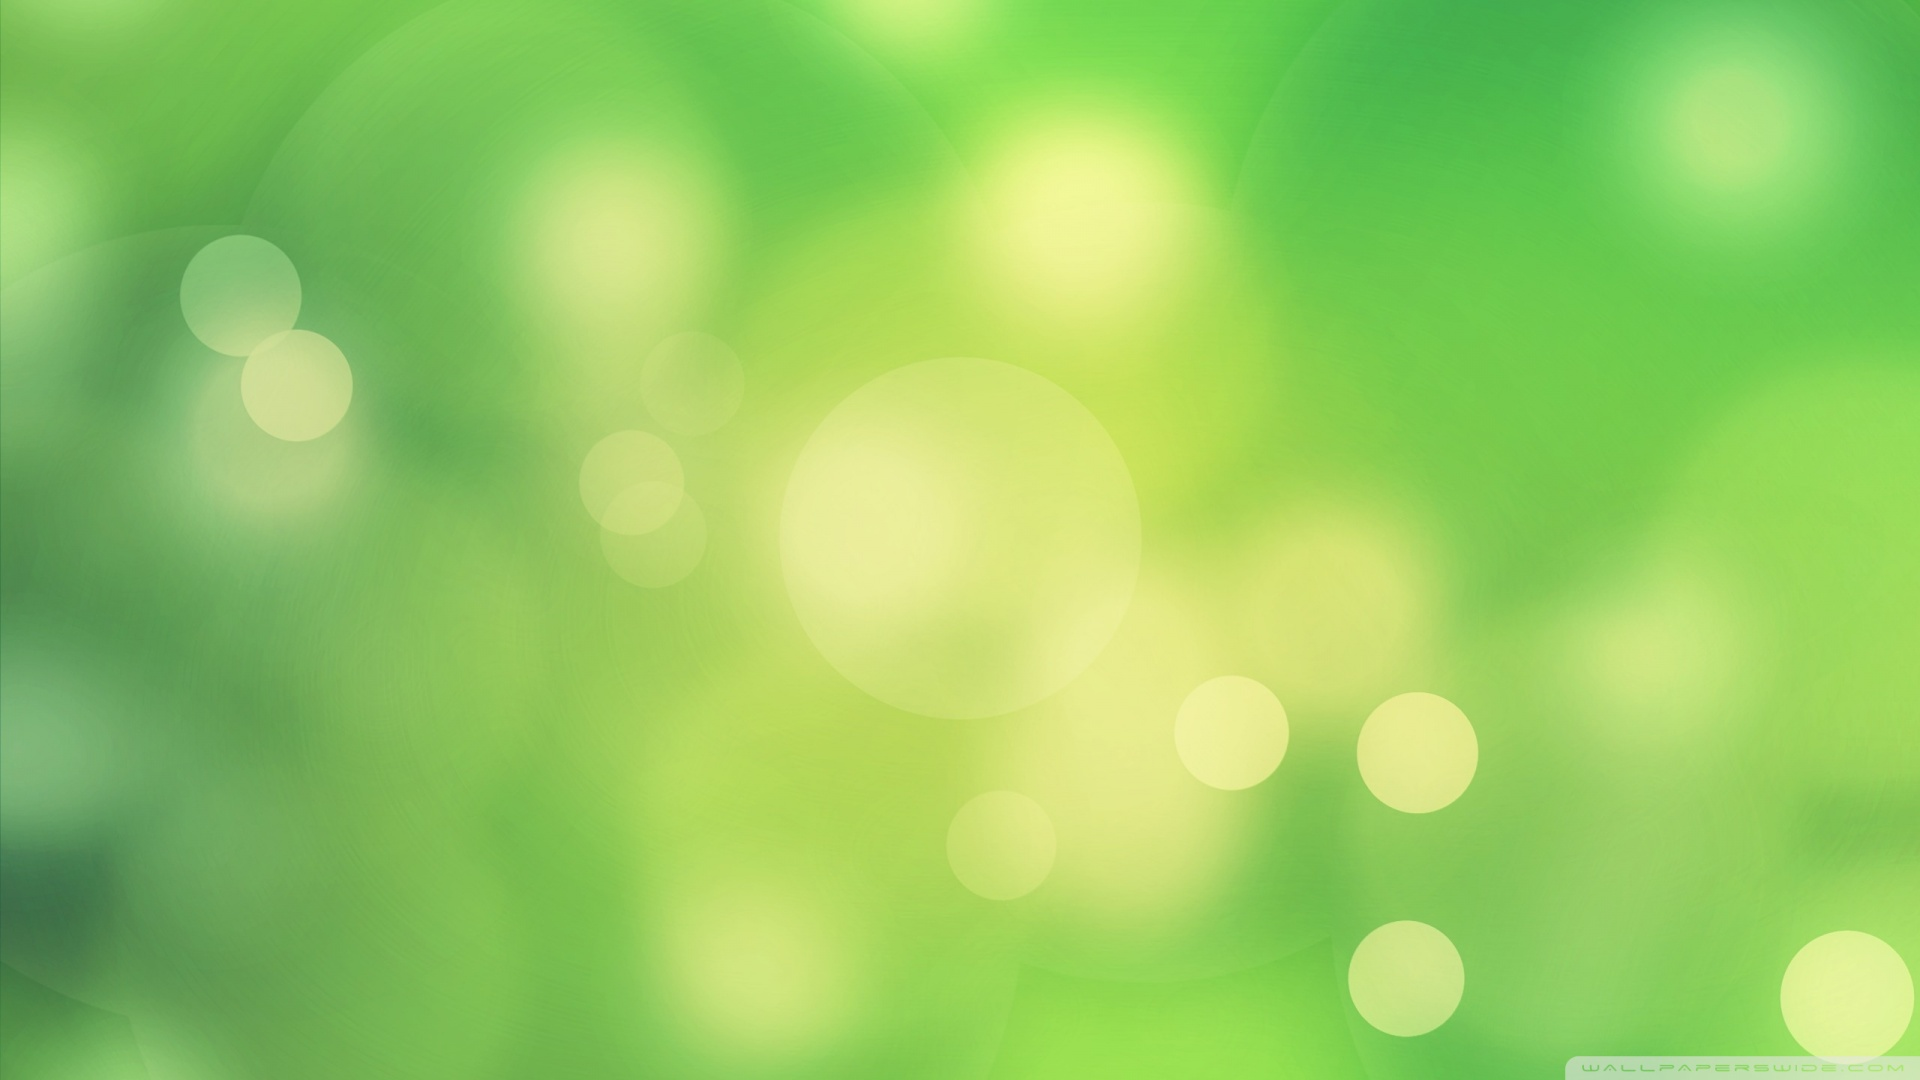 Download Green Background 2 Wallpaper 1920x1080 1920x1080